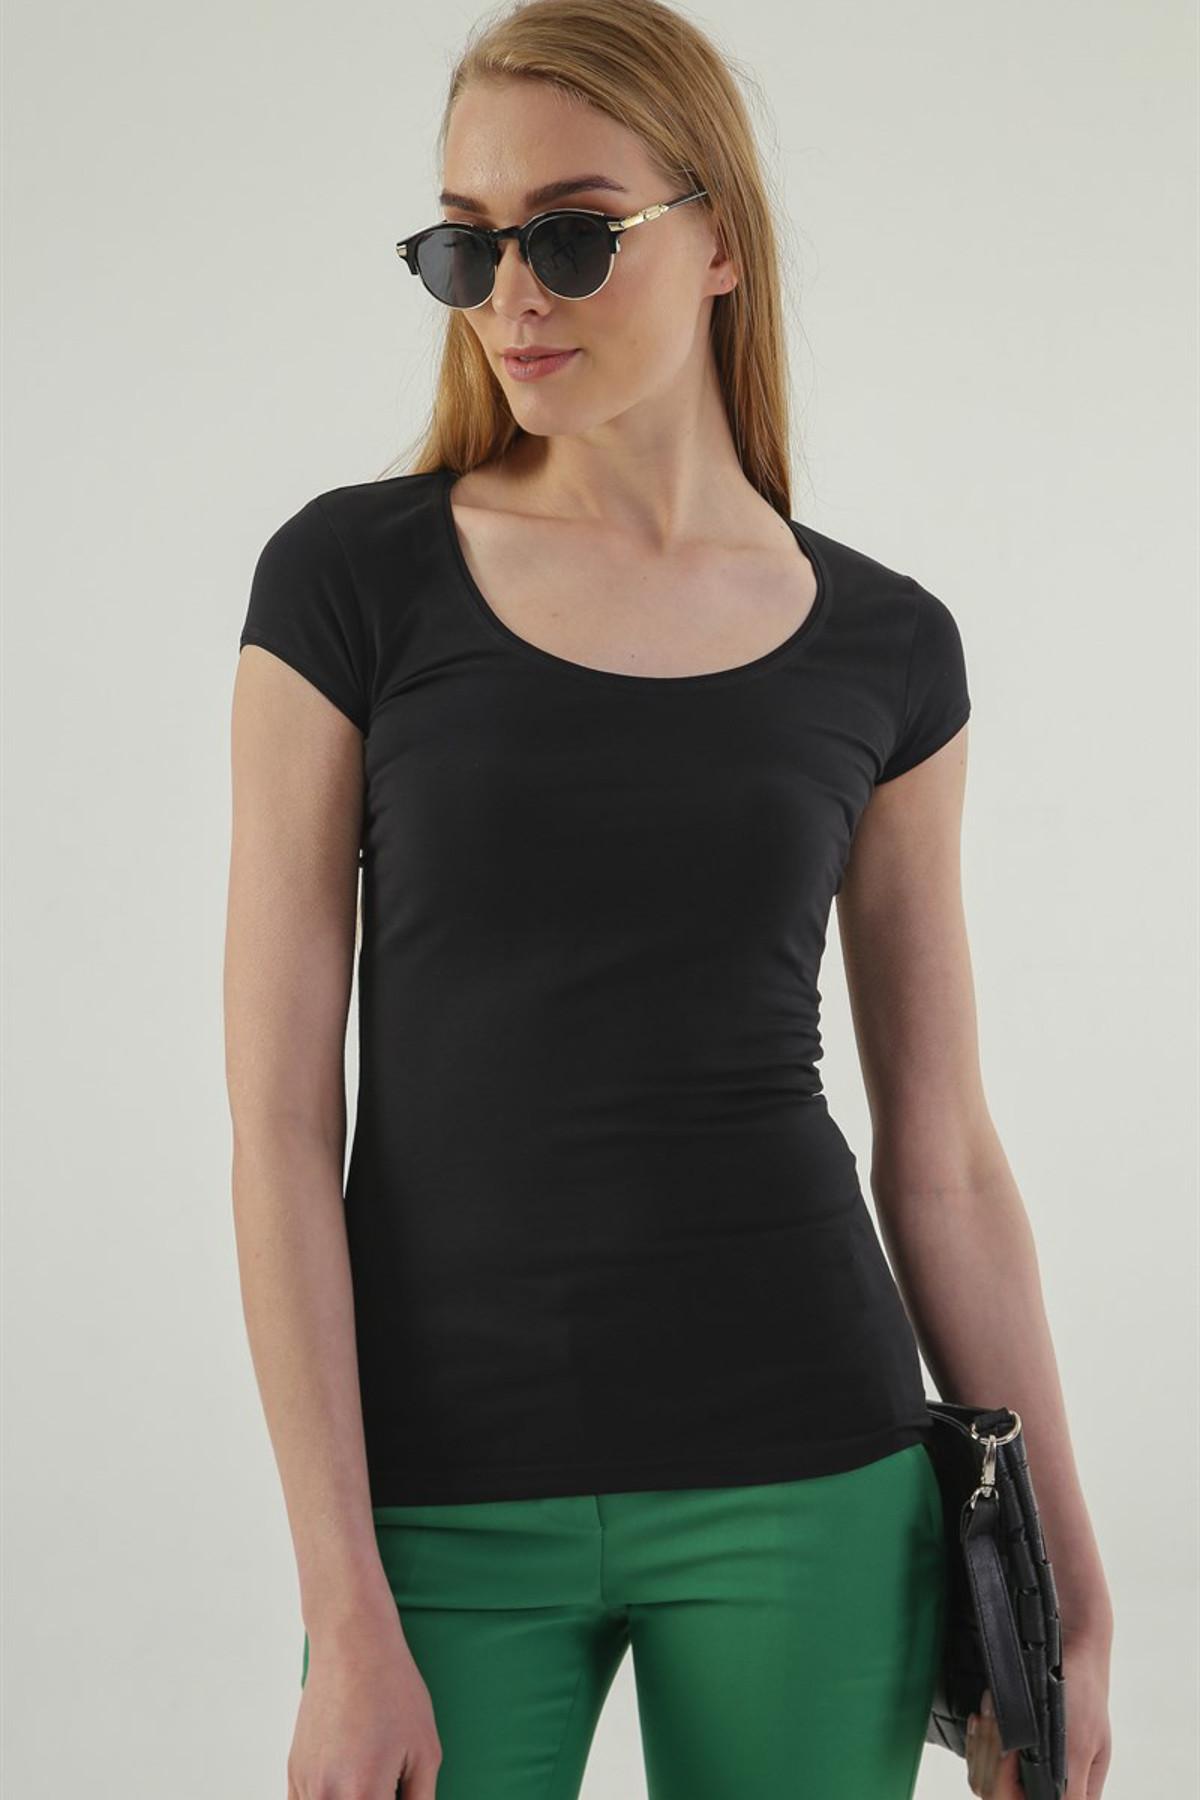 Jument Kadın Siyah Monalisa Balen Yaka Kısa Kol T-Shirt 5610 1